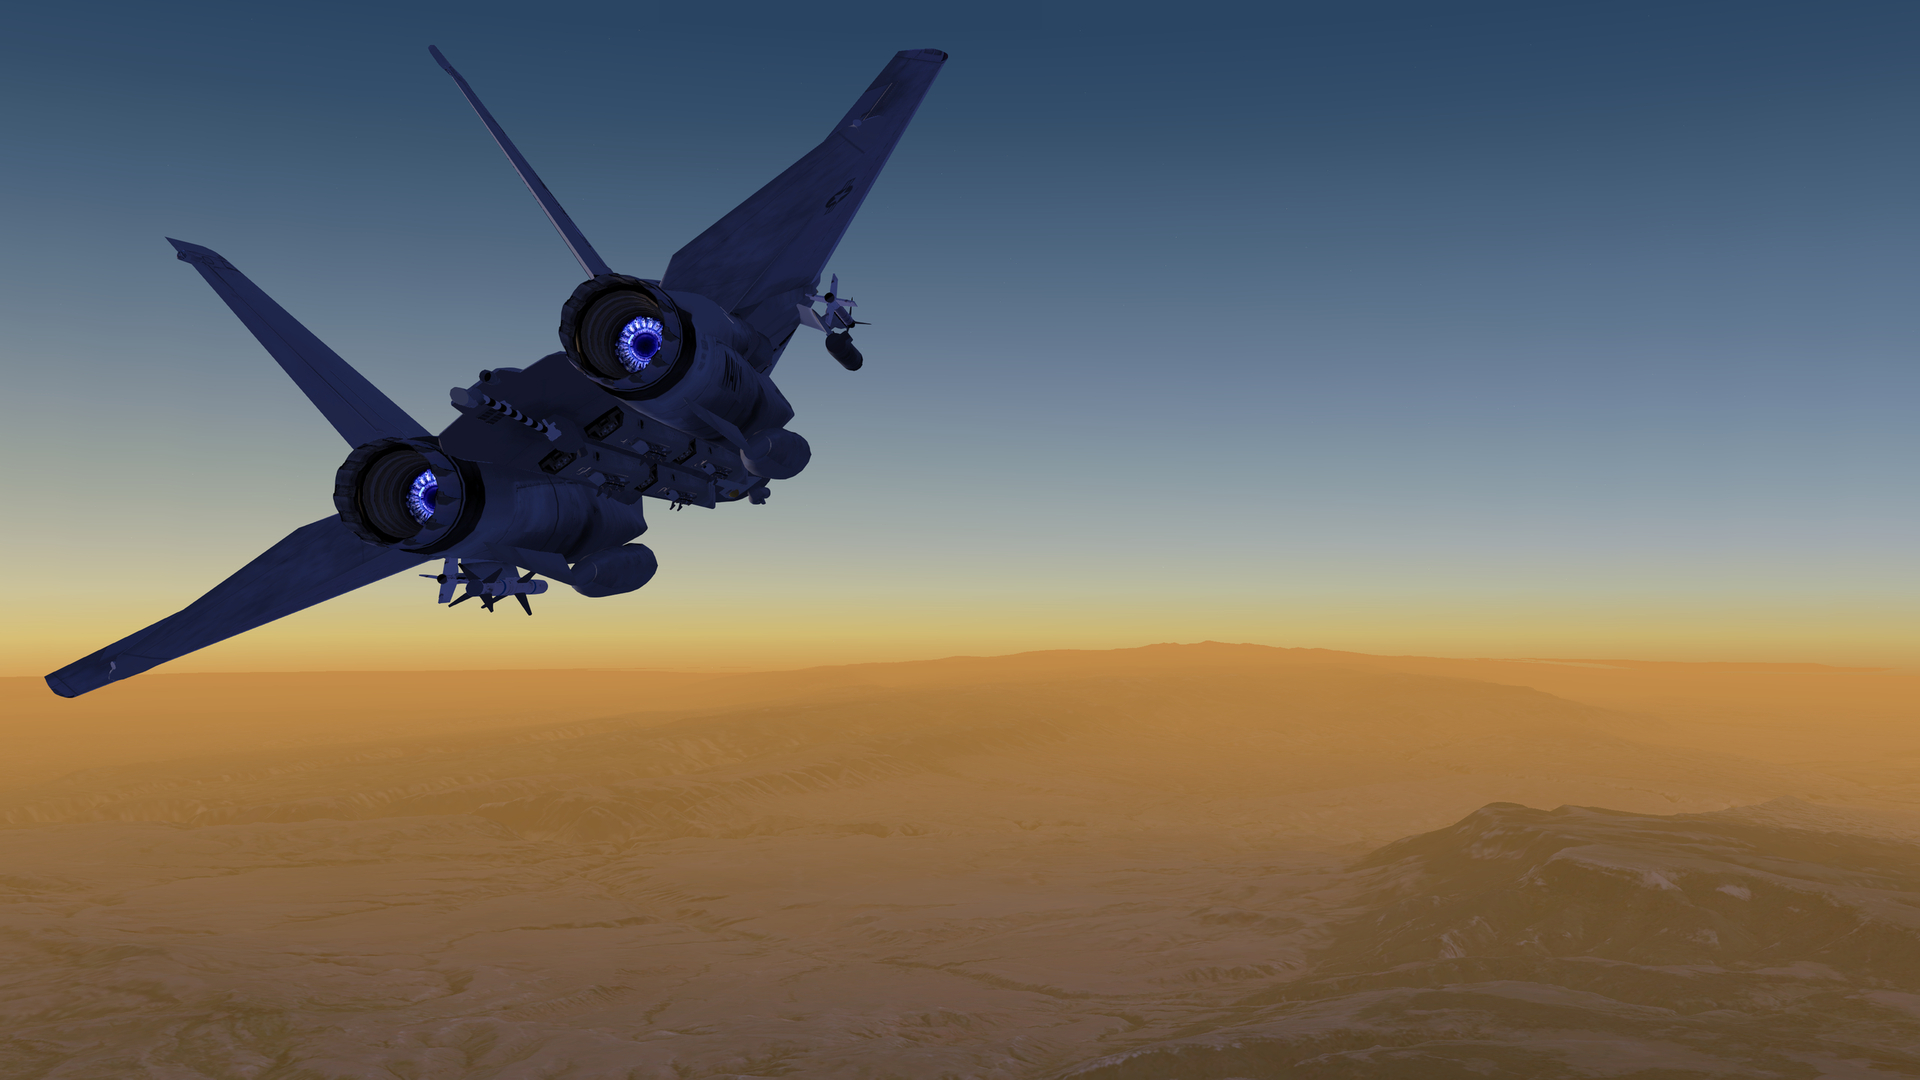 Microsoft Flight Simulator Wallpaper 18419 1920x1080